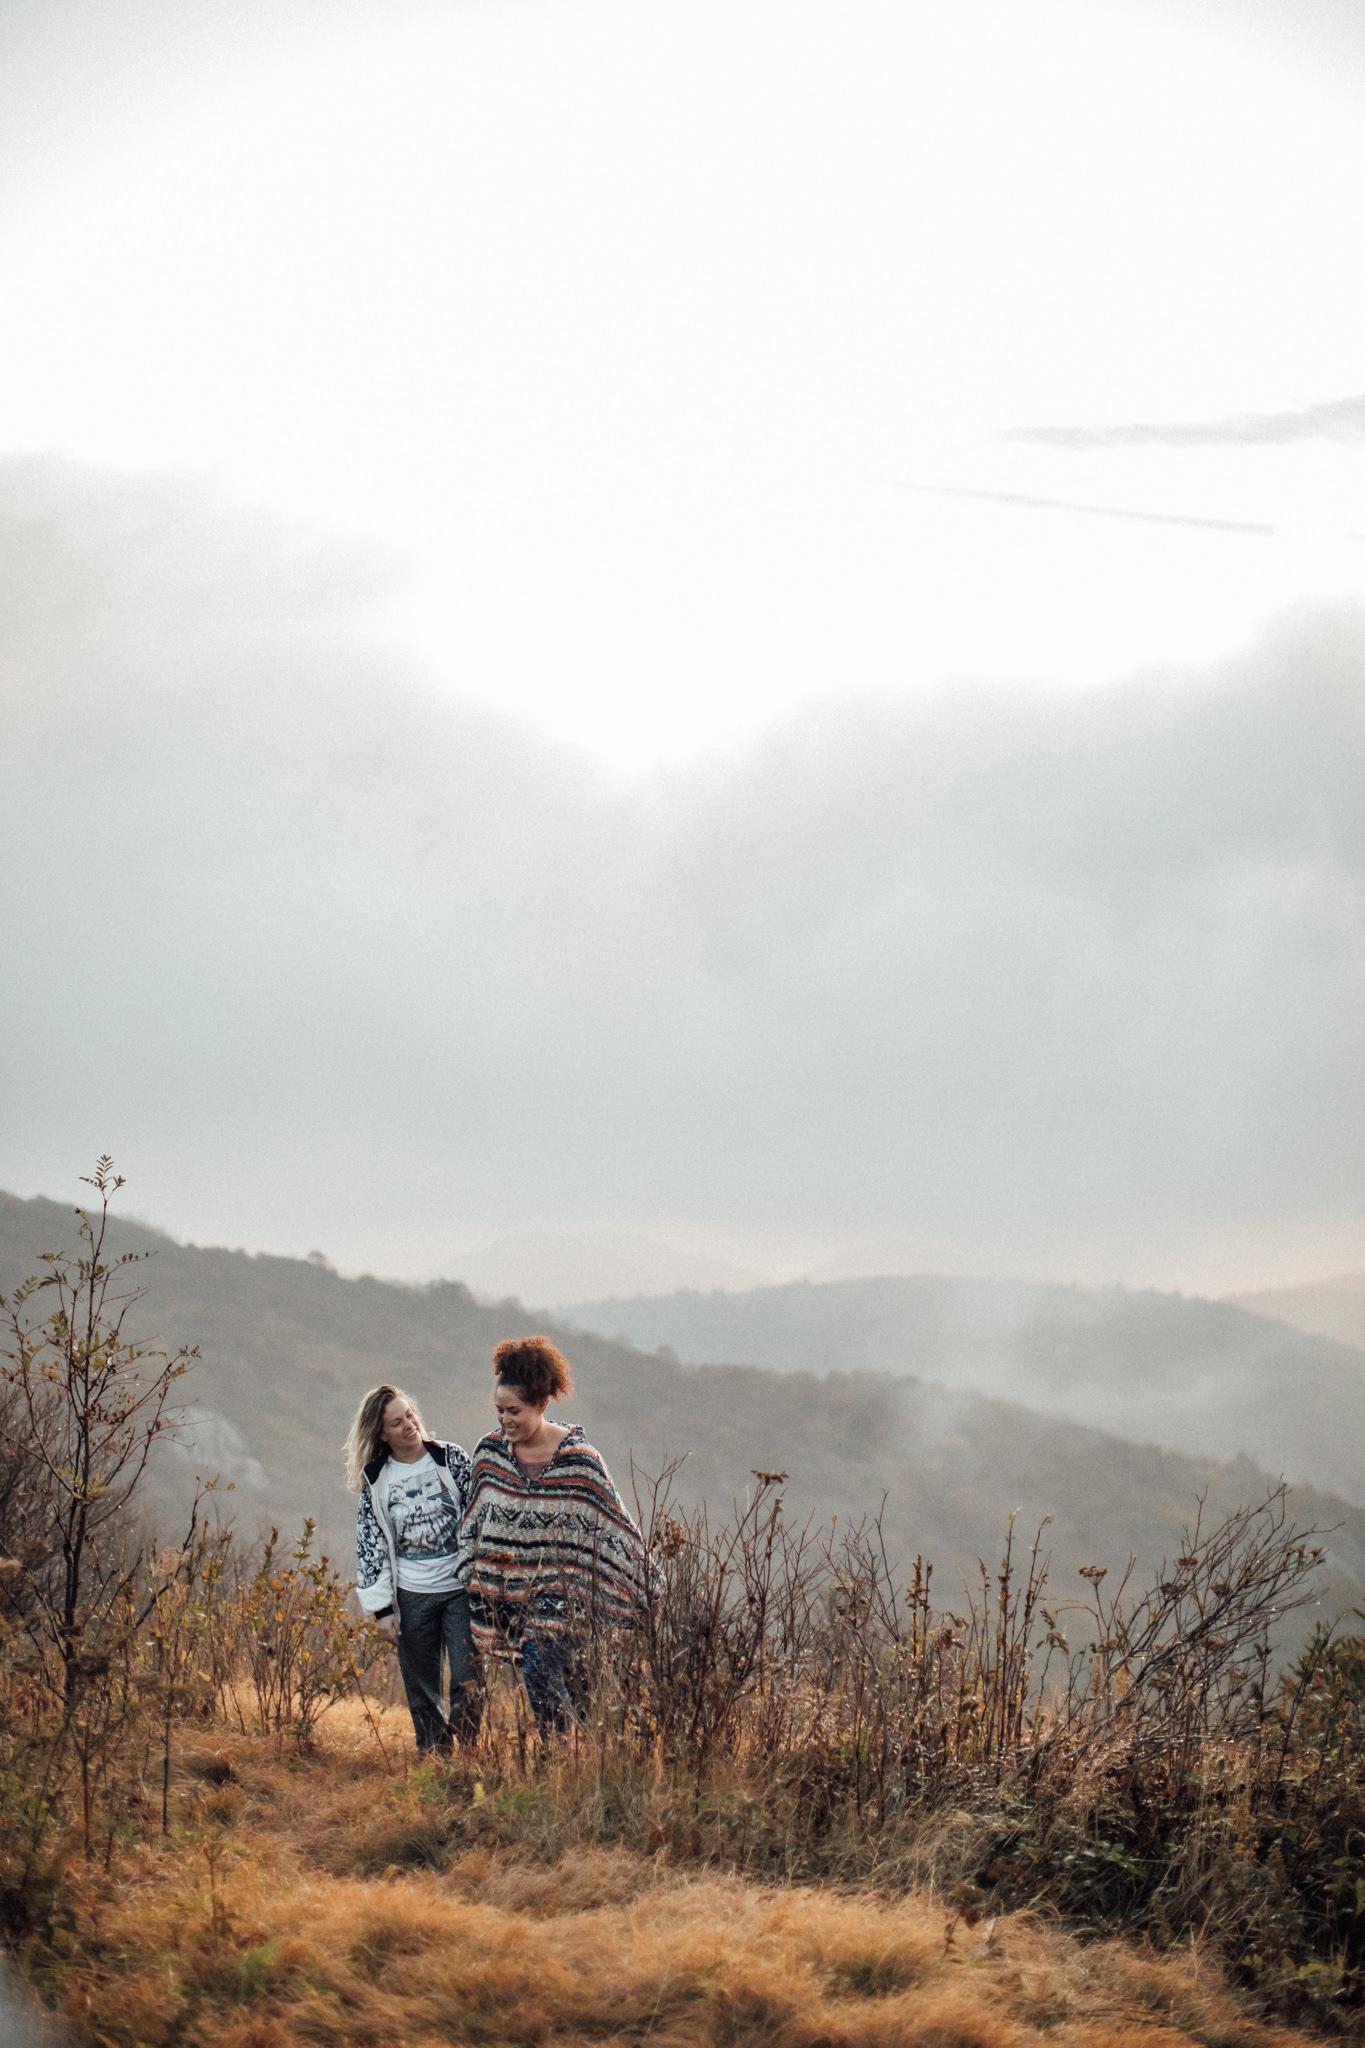 cassie-cook-photography-black-balsam-knob-sunrise-hike-same-sex-engagement-session-asheville-wedding-photographer